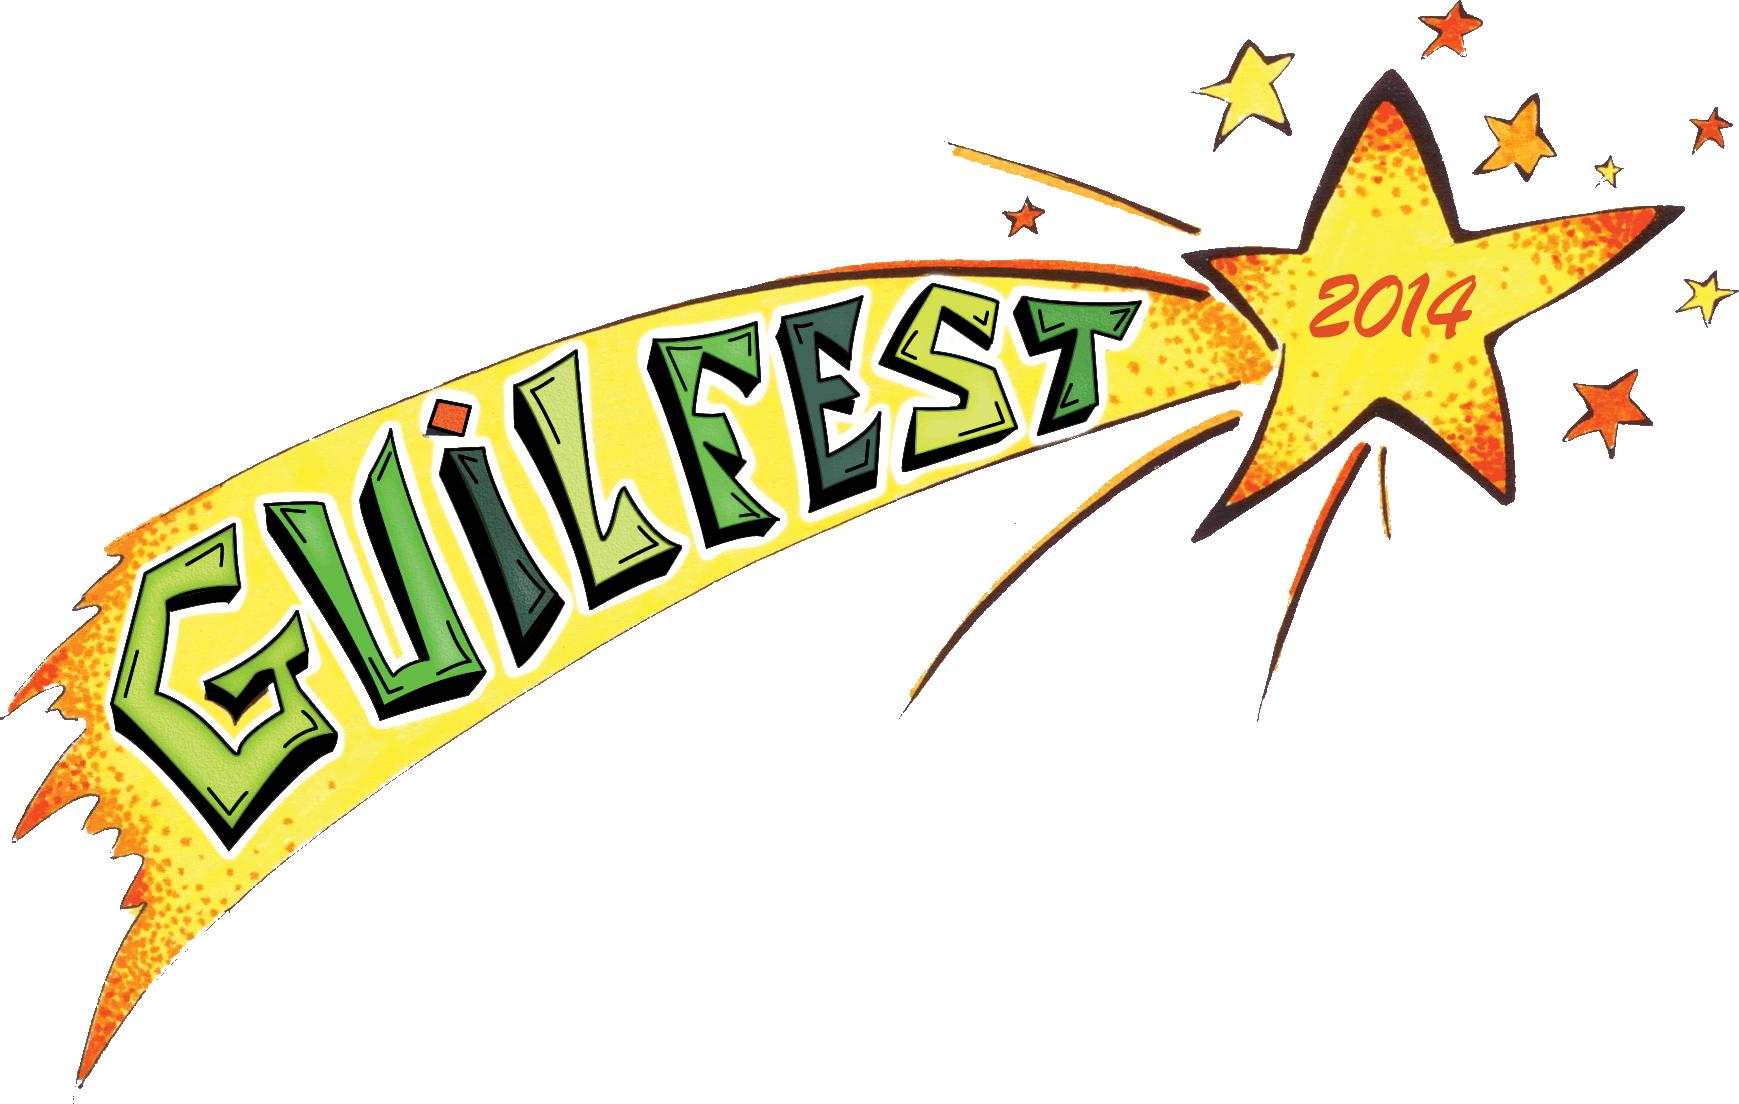 GuilFest logo (1)